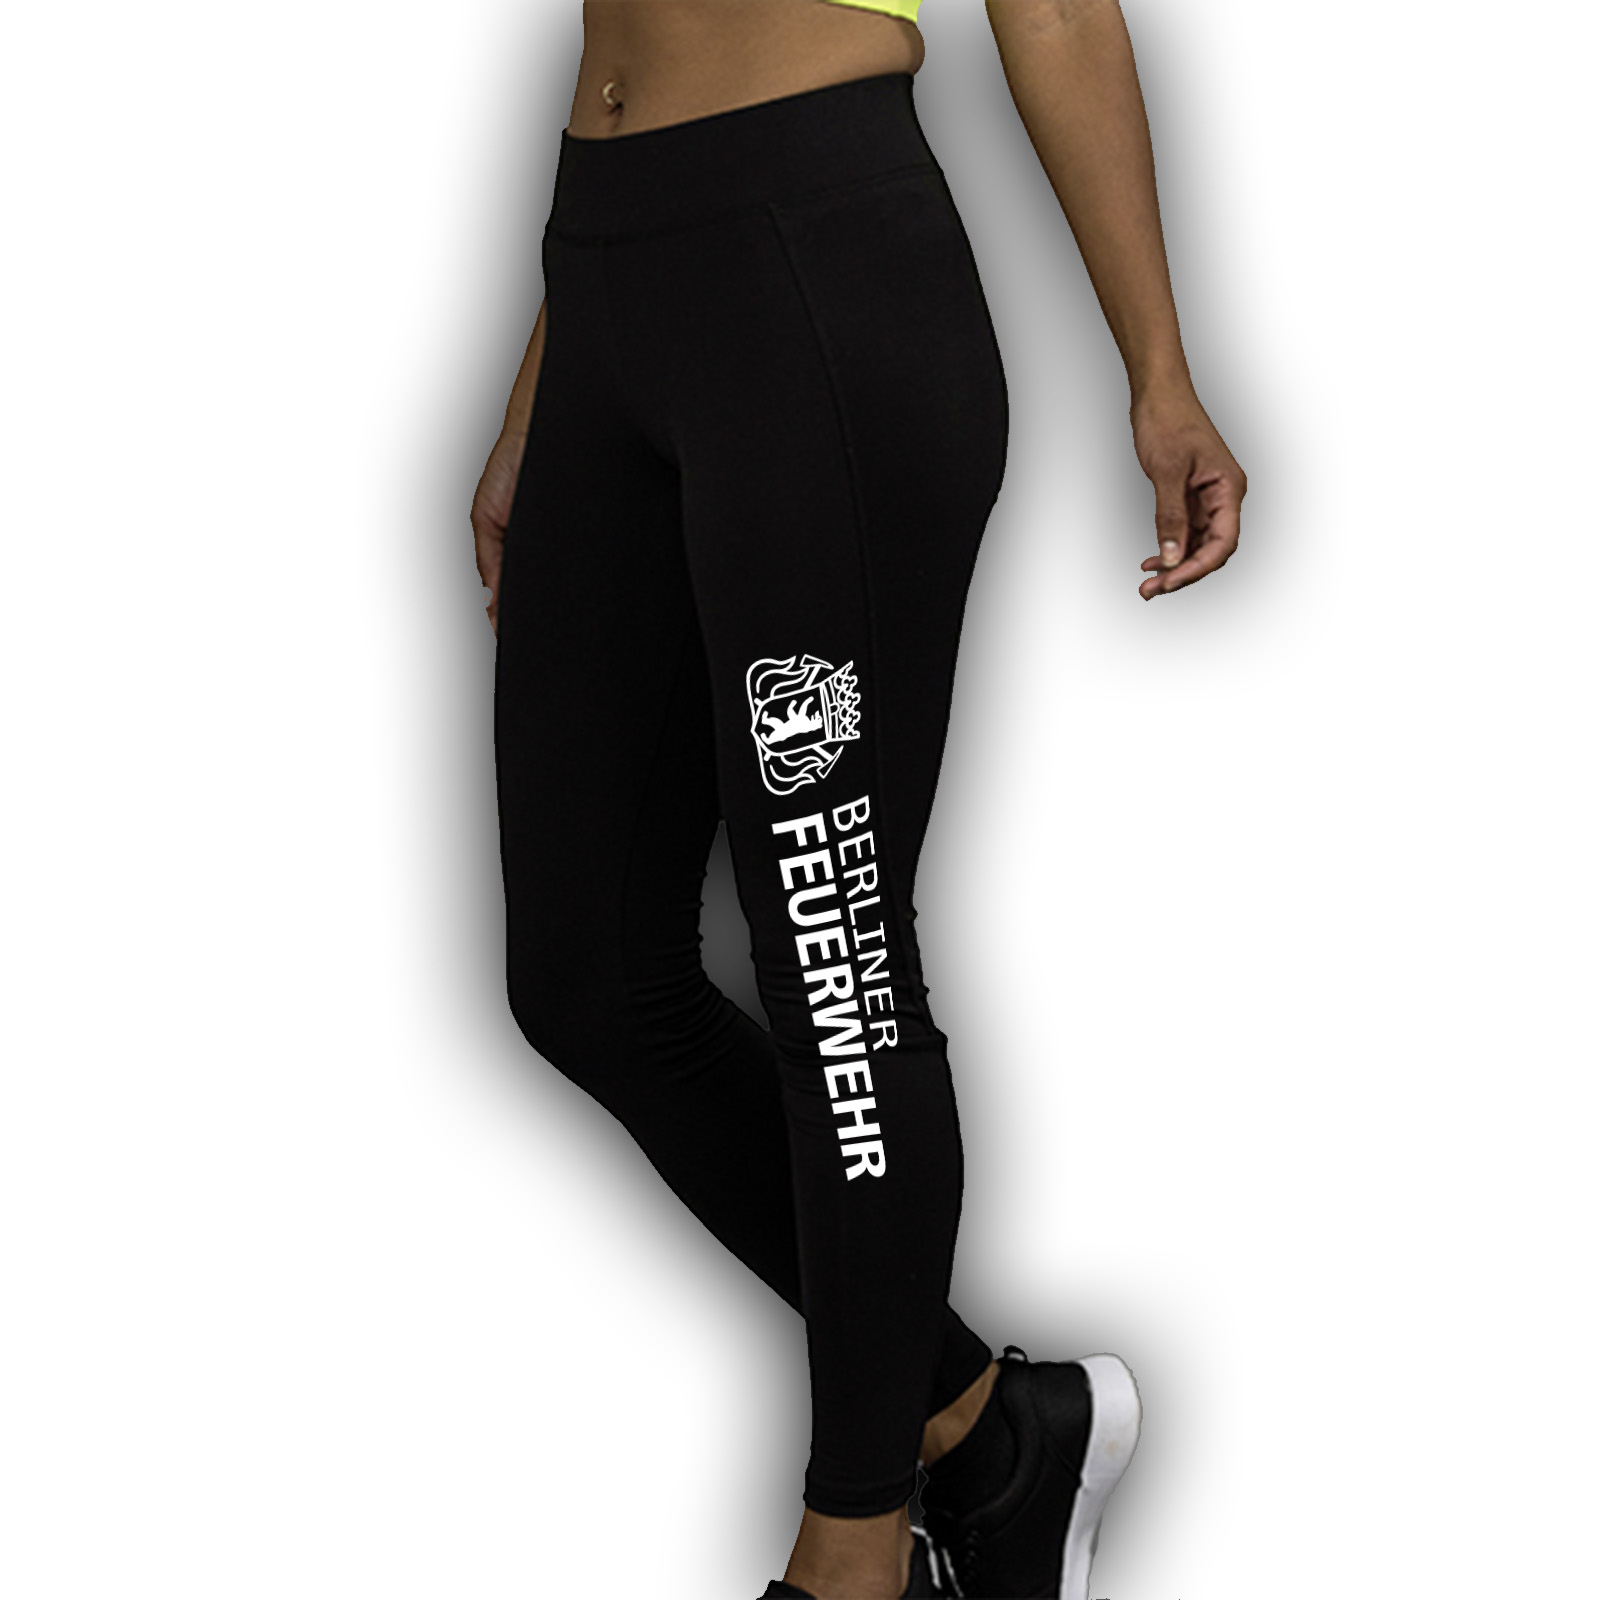 damen sport leggings lang bf hauptstadtfeuerwehr. Black Bedroom Furniture Sets. Home Design Ideas